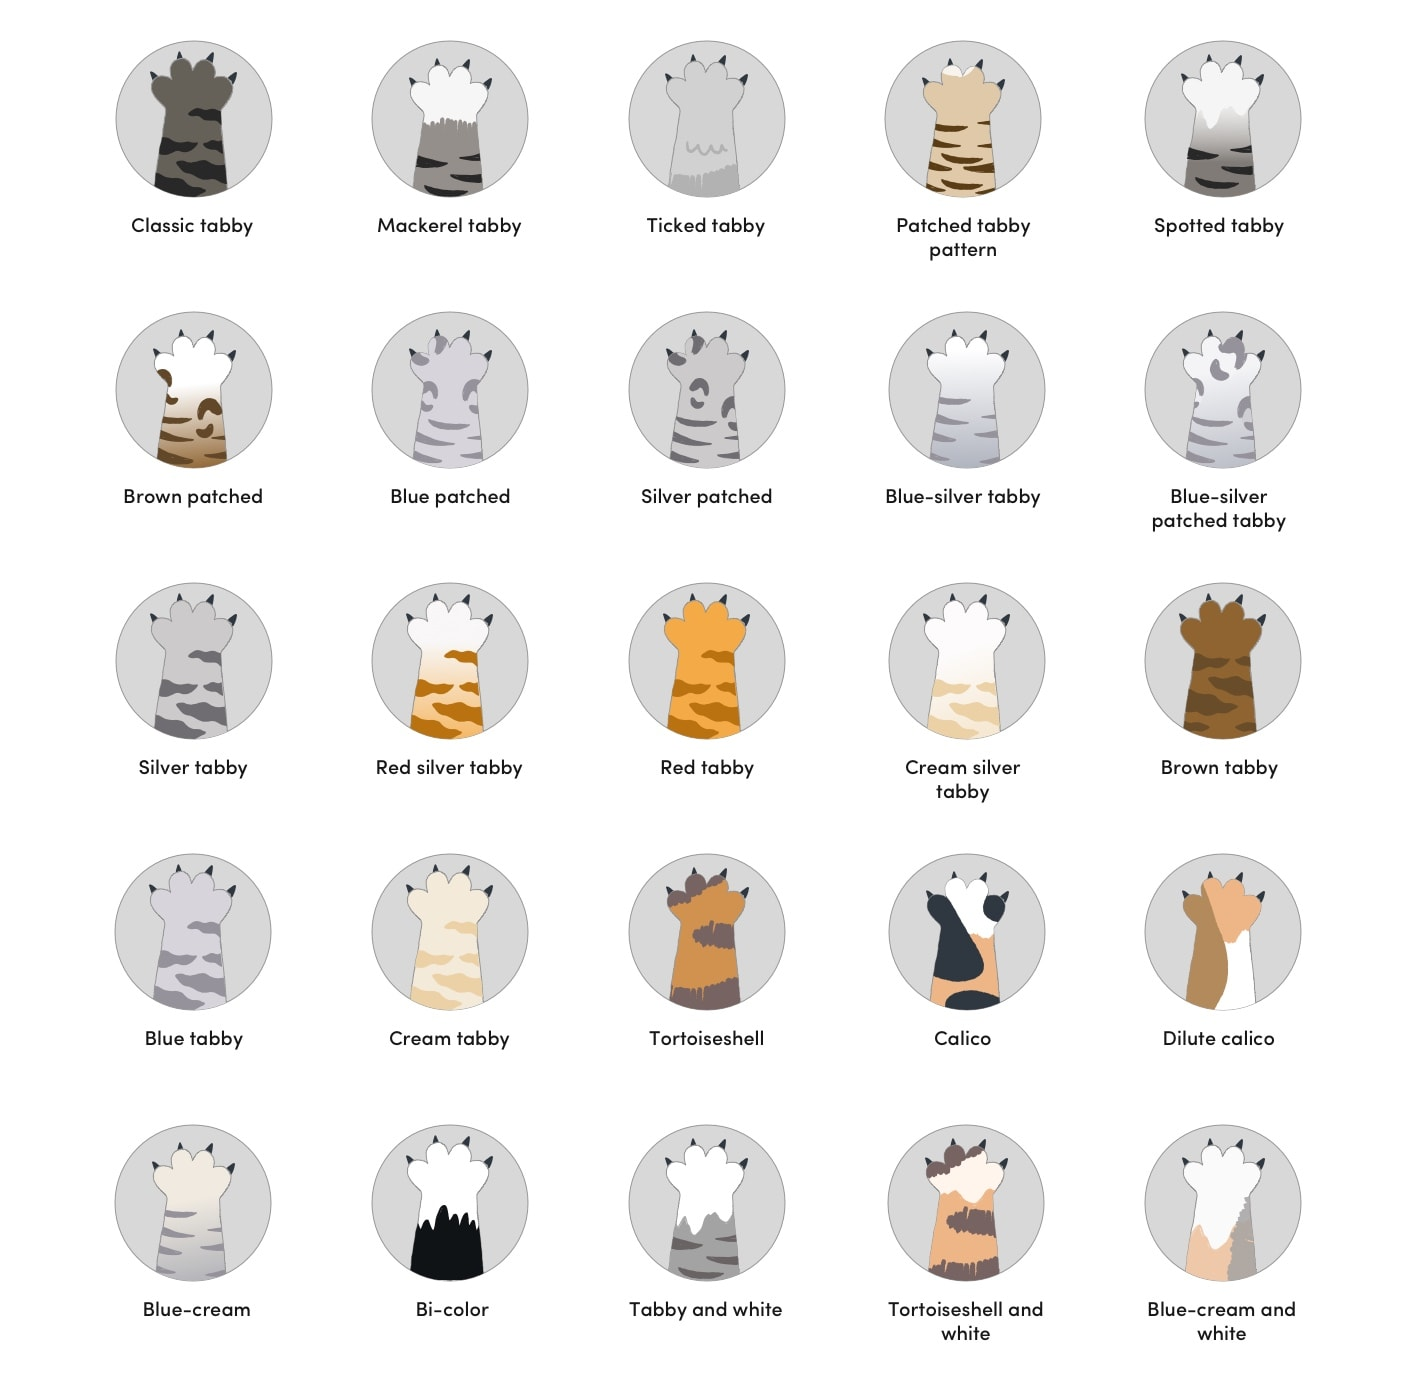 42 Manx Cat Colors & Patterns 2